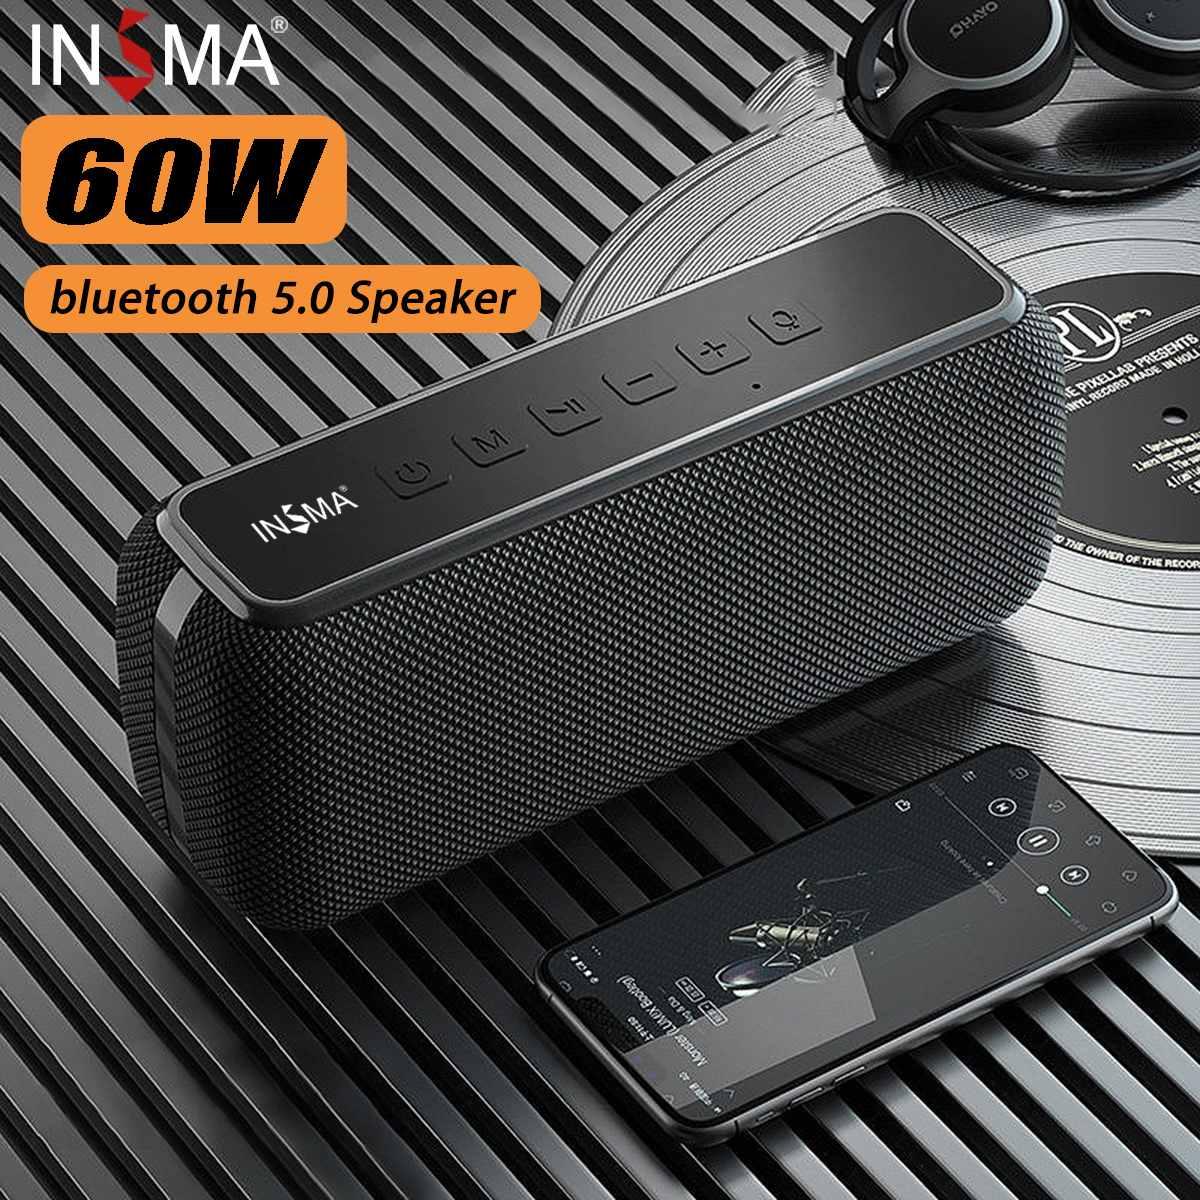 INSMA-سماعة بلوتوث لاسلكية 60 وات ، مكبر صوت ، IPX5 مقاوم للماء ، TWS ، وقت تشغيل 15 ساعة ، مساعد صوت ، مضخم صوت ، صوت جهير إضافي